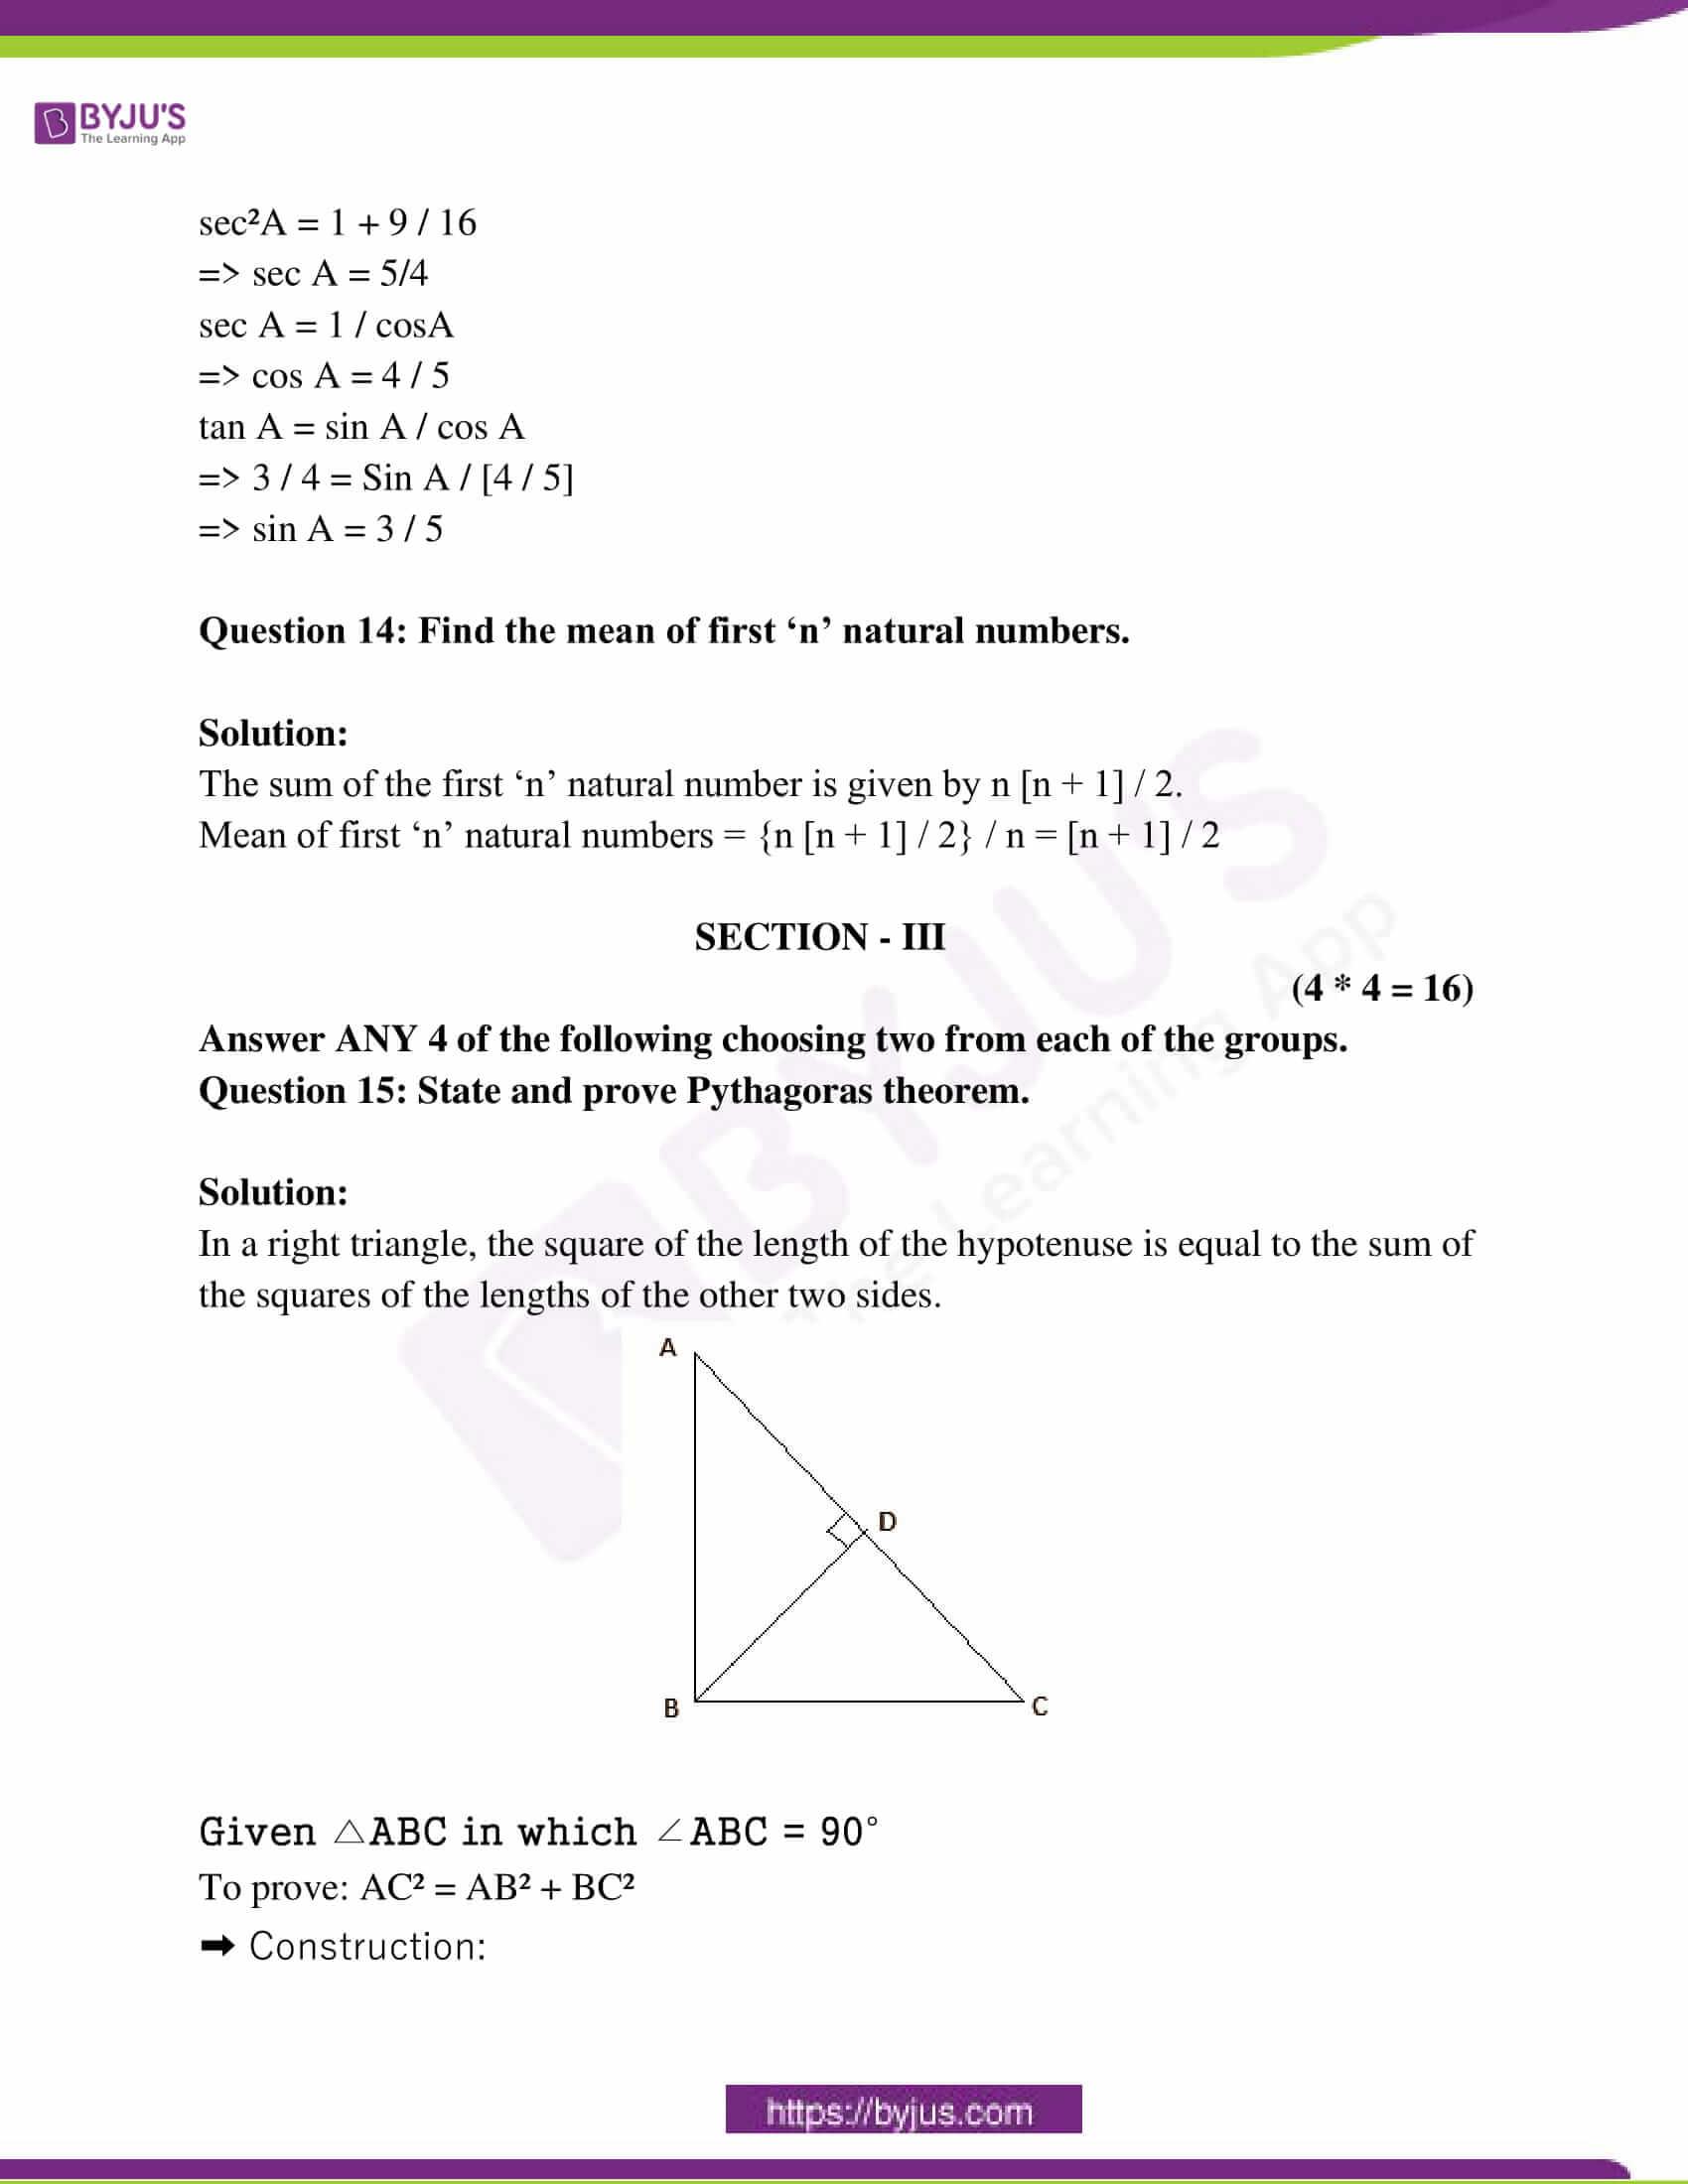 ap class 10 maths question paper 2 sol march 2016 06